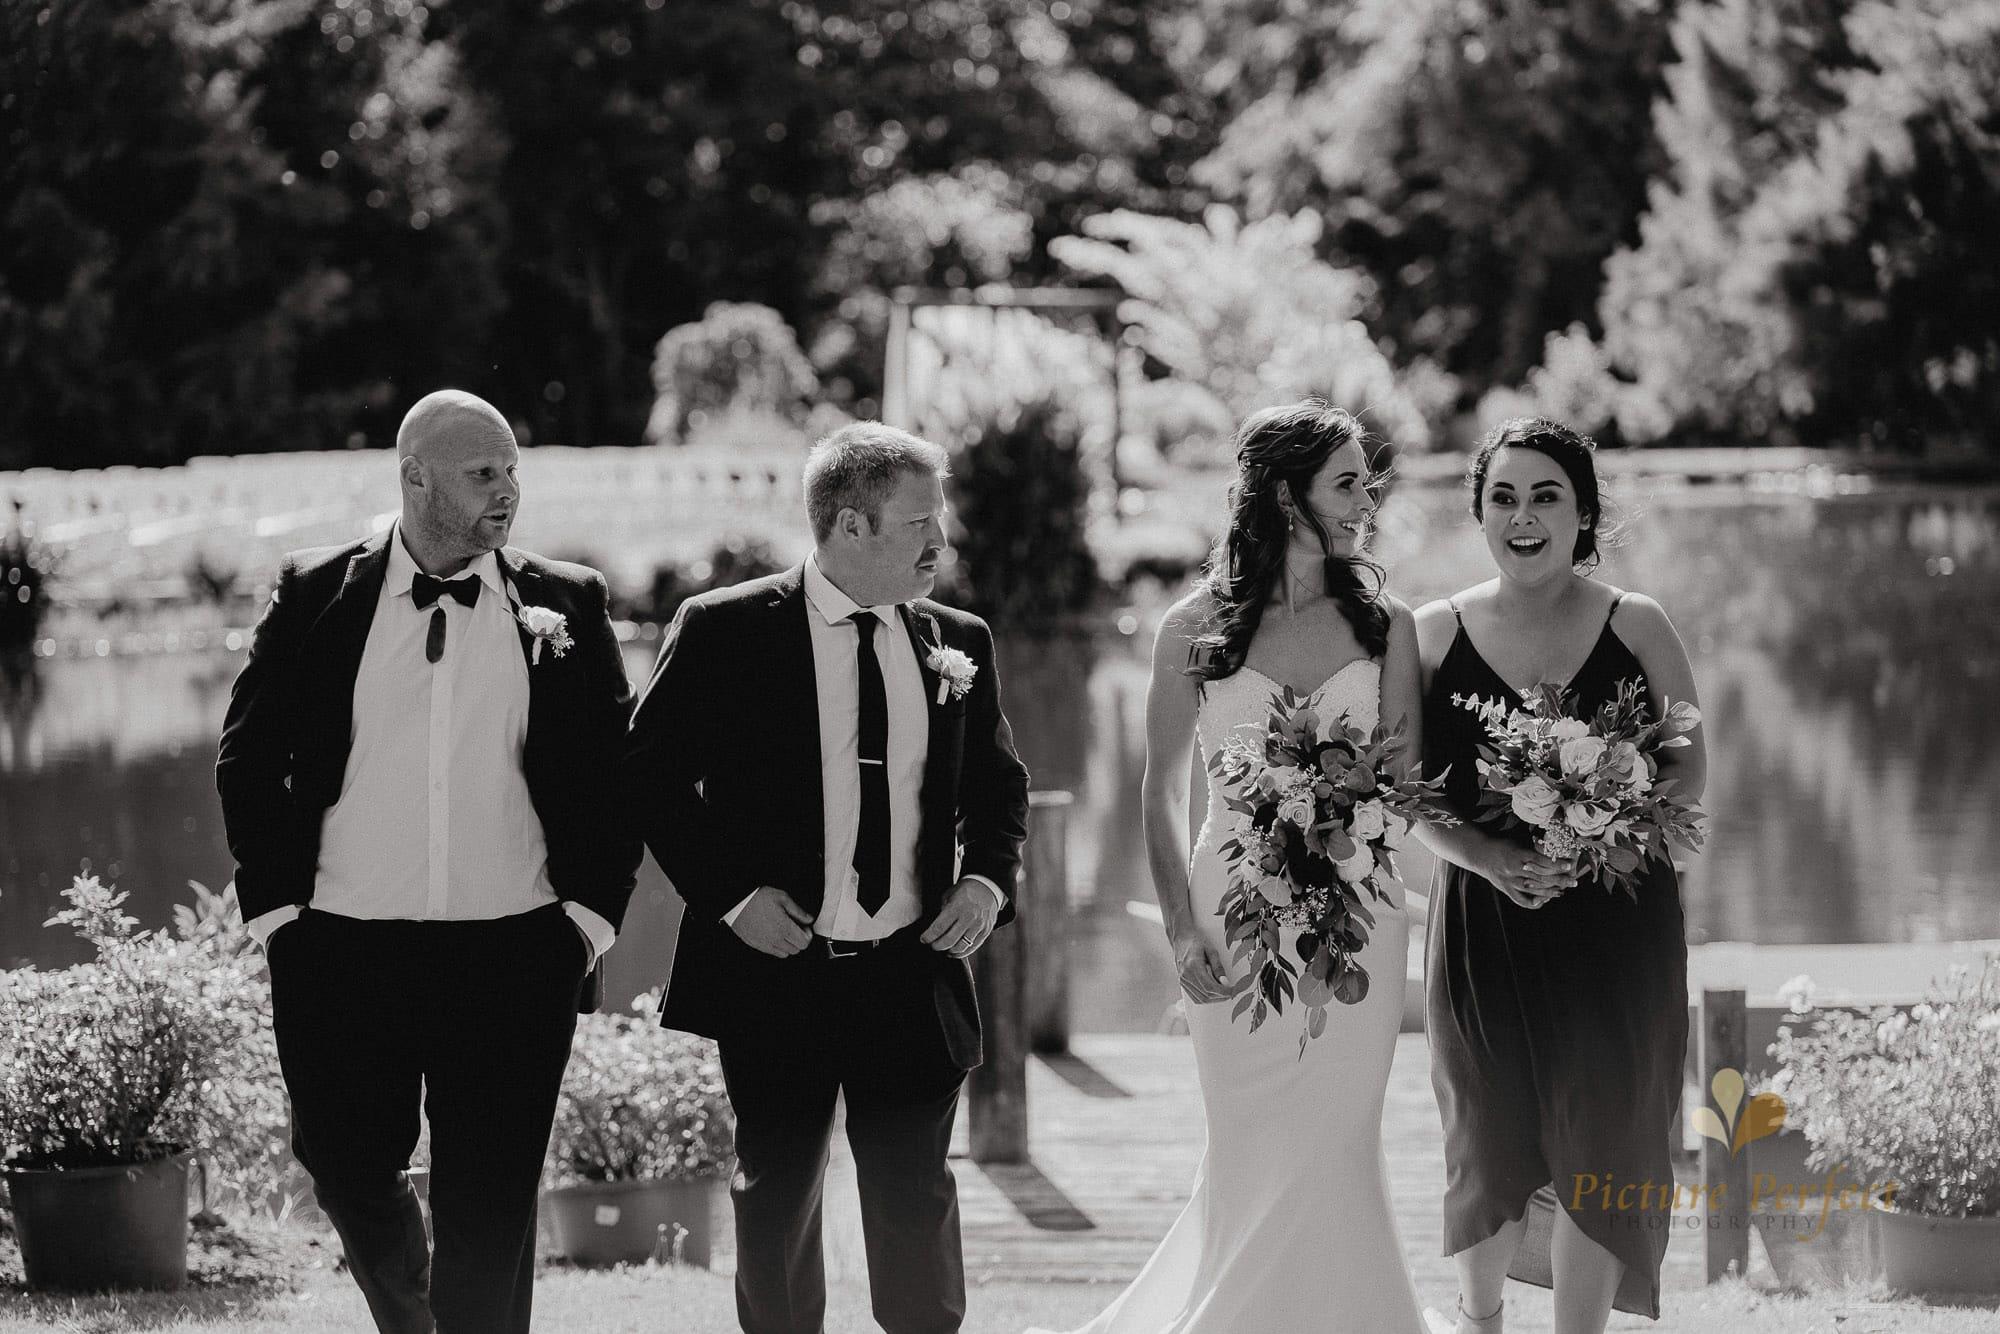 Roseburb Park wedding of Casey 3643